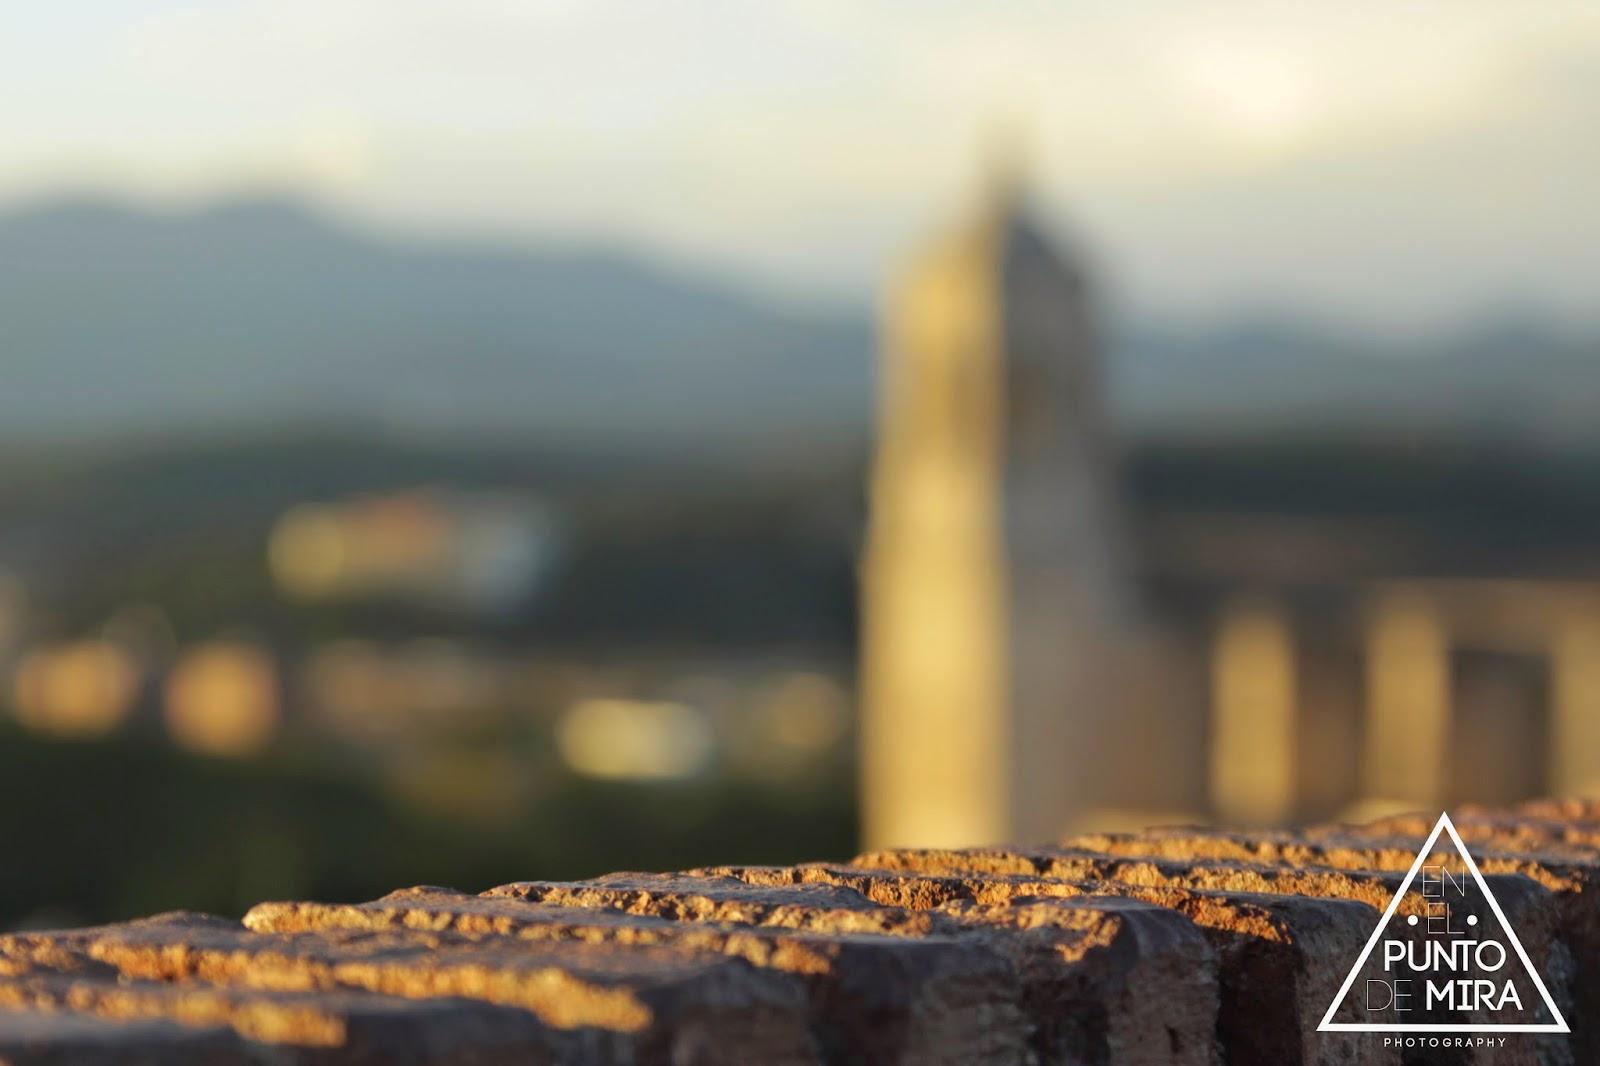 En el punto de mira photography la muralla torre sant domenech catedral girona